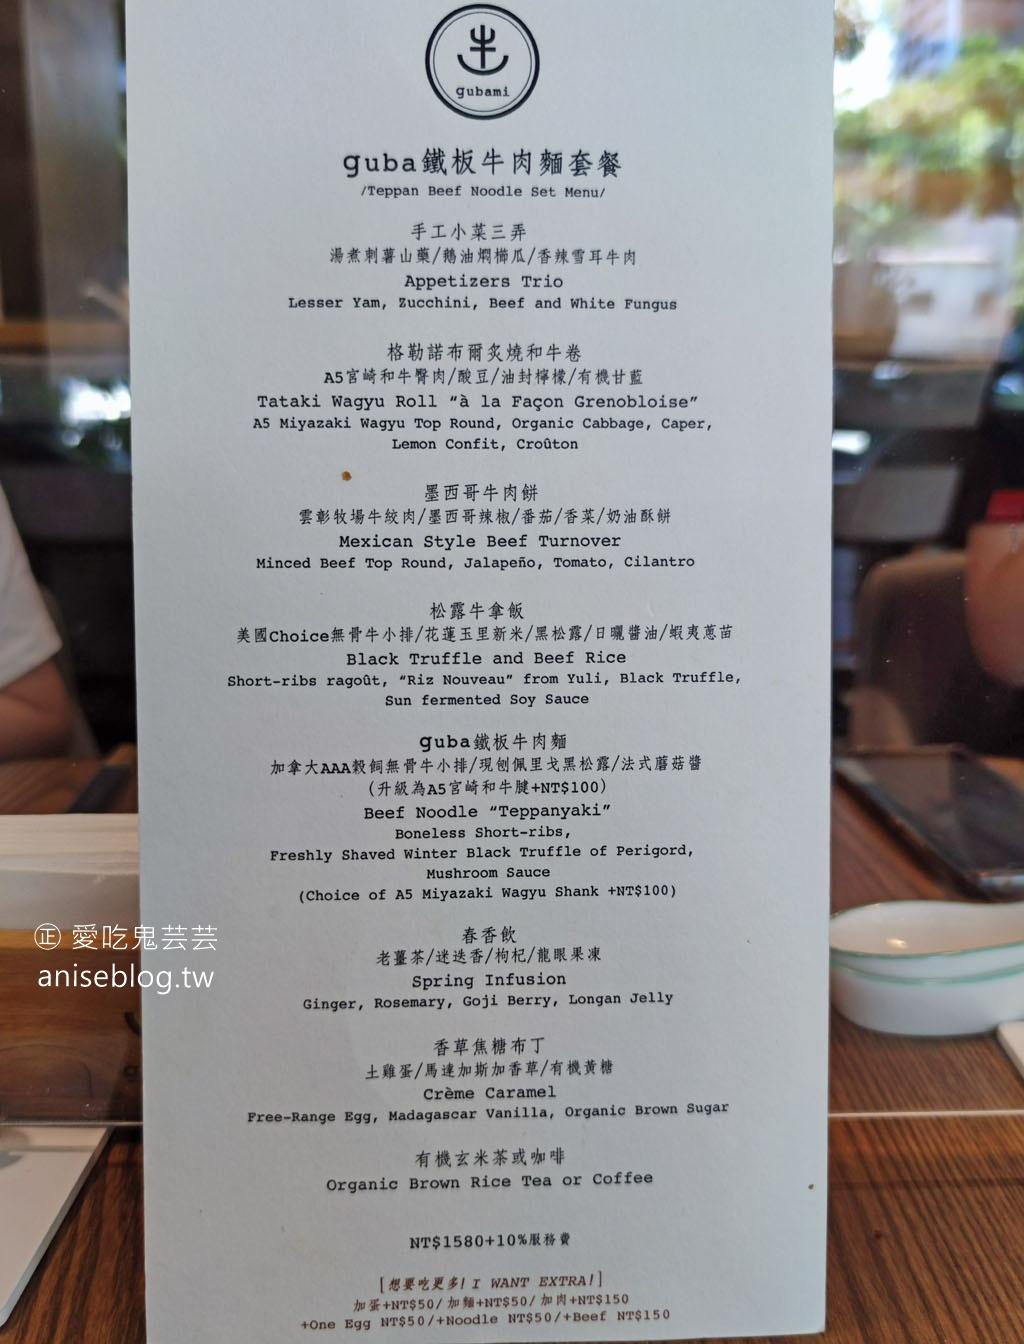 GUBAMI牛肉麵@台中米其林必比登推介,樂沐旗下千元牛肉麵